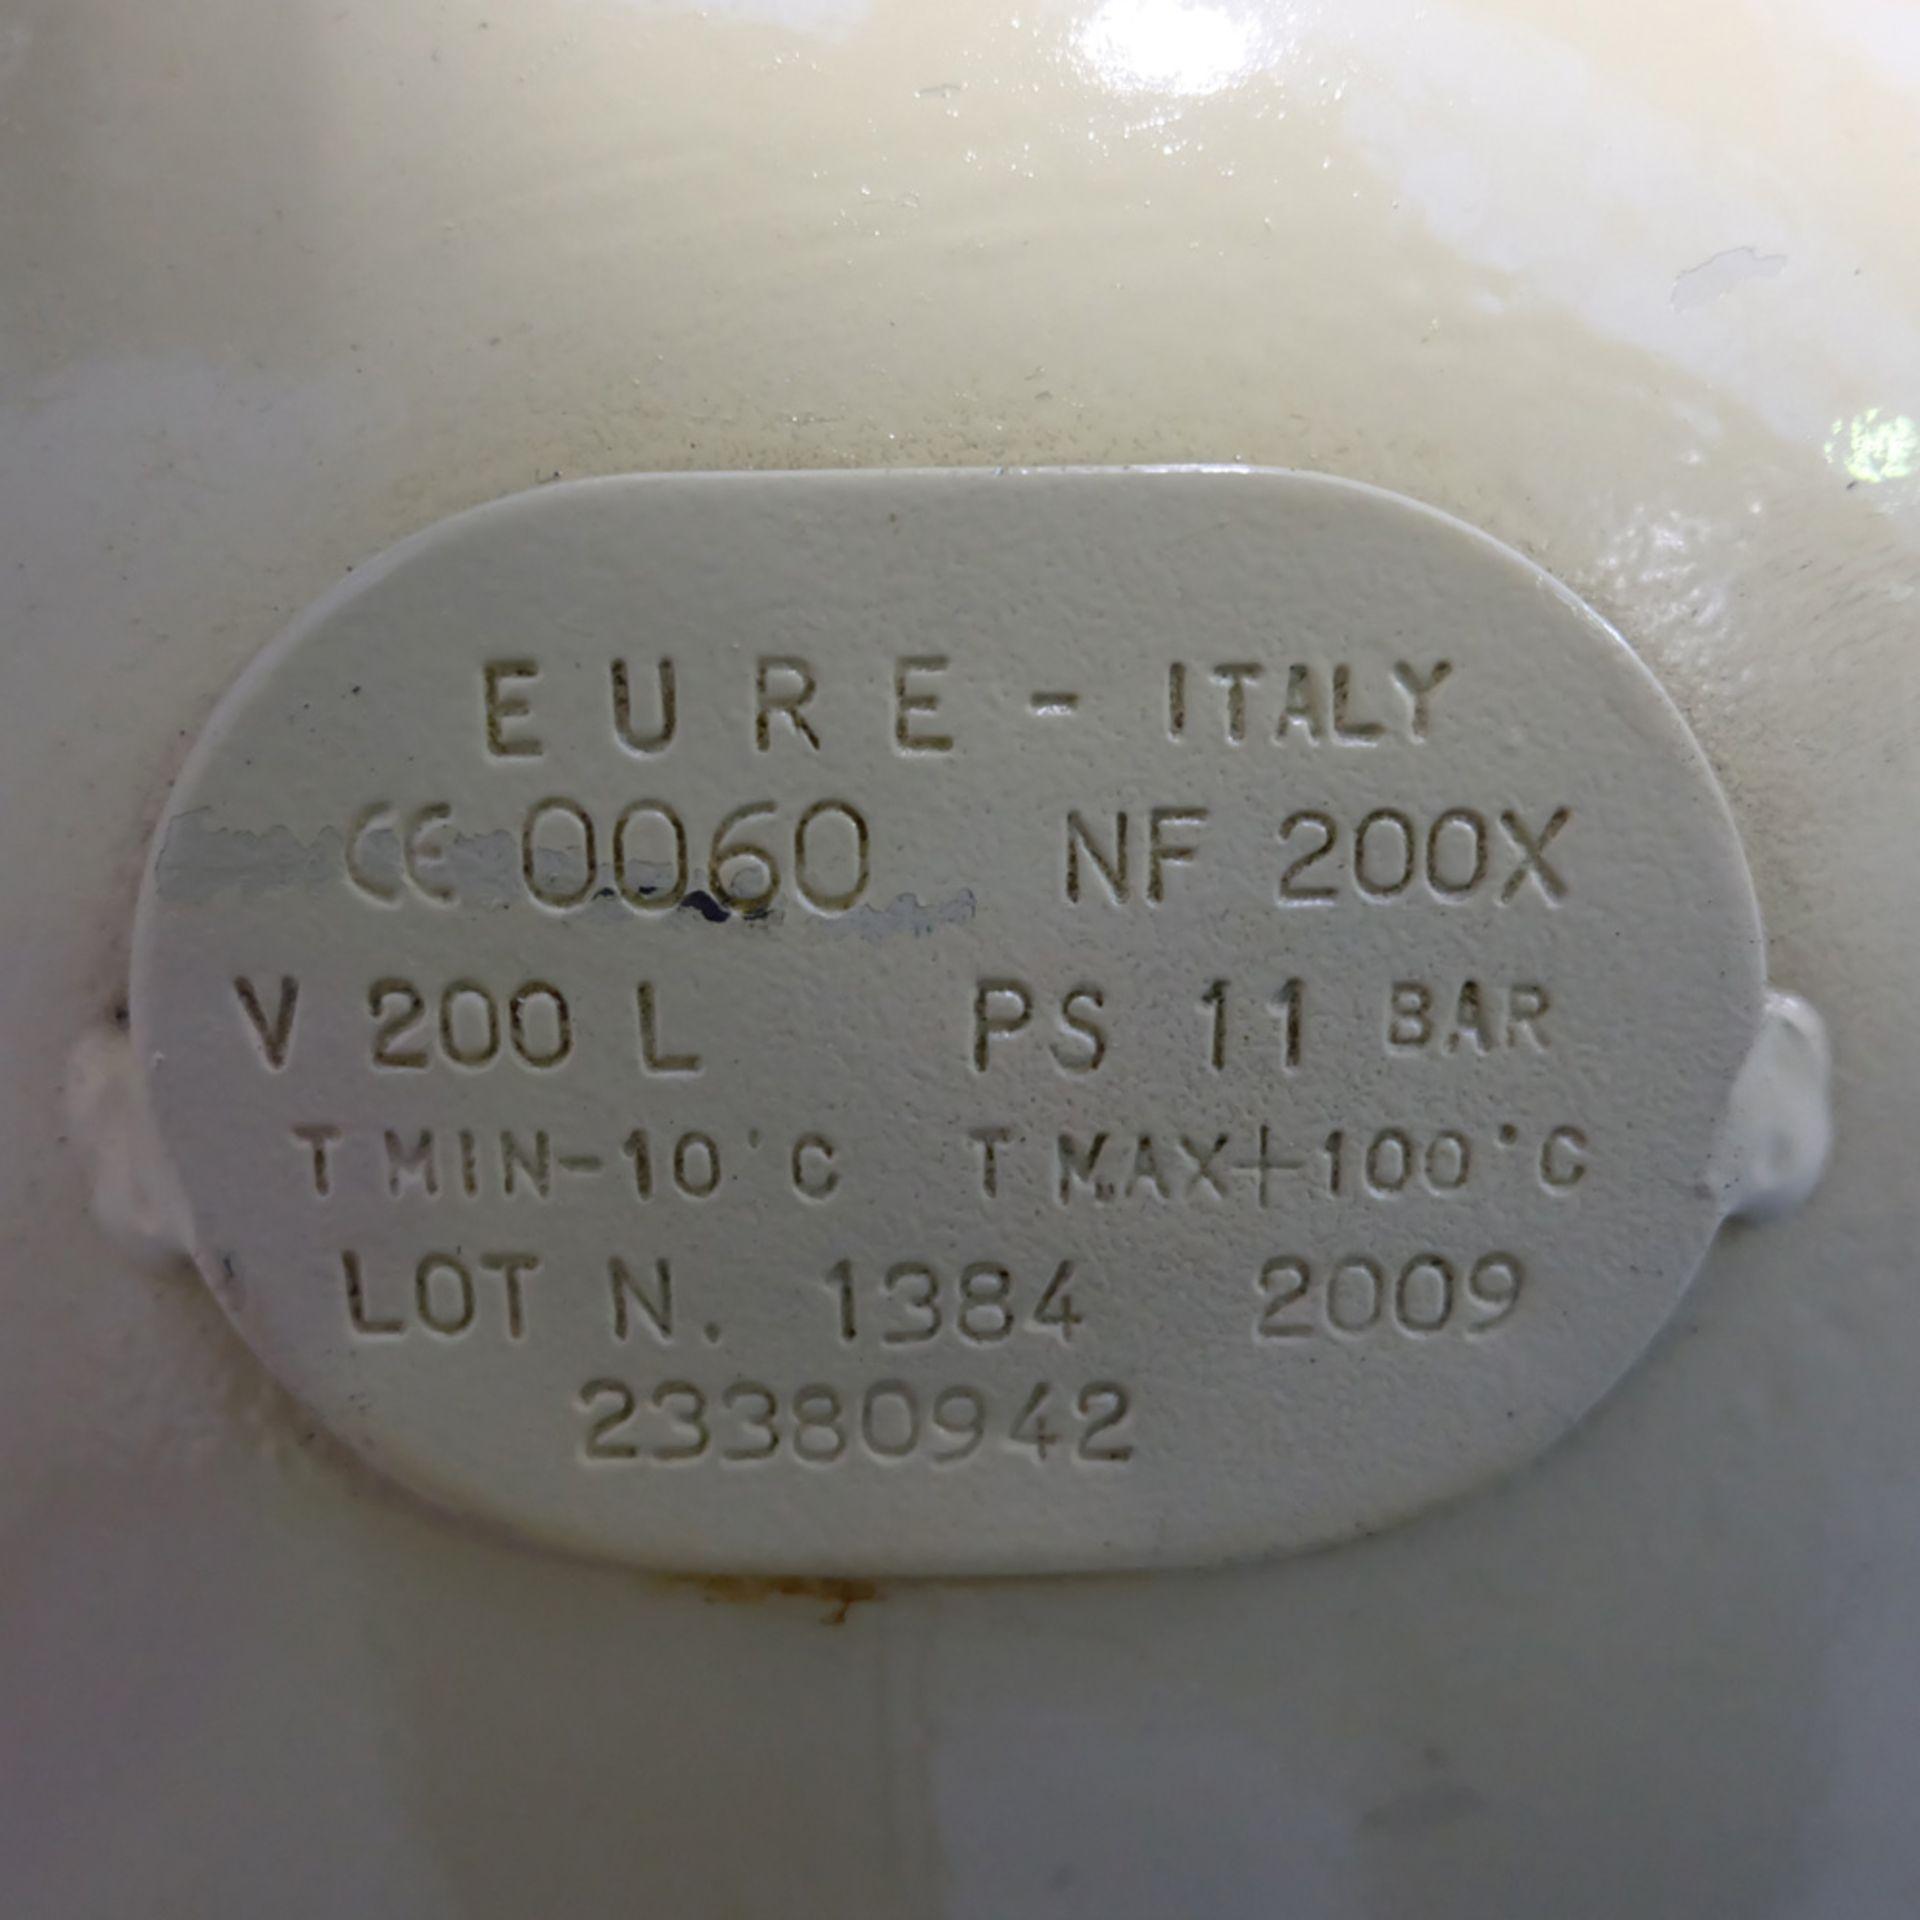 Ingersoll Rand Model R5.5IU D-SD Rotary Air Compressor. Working Pressure 10 Bar. - Image 9 of 9